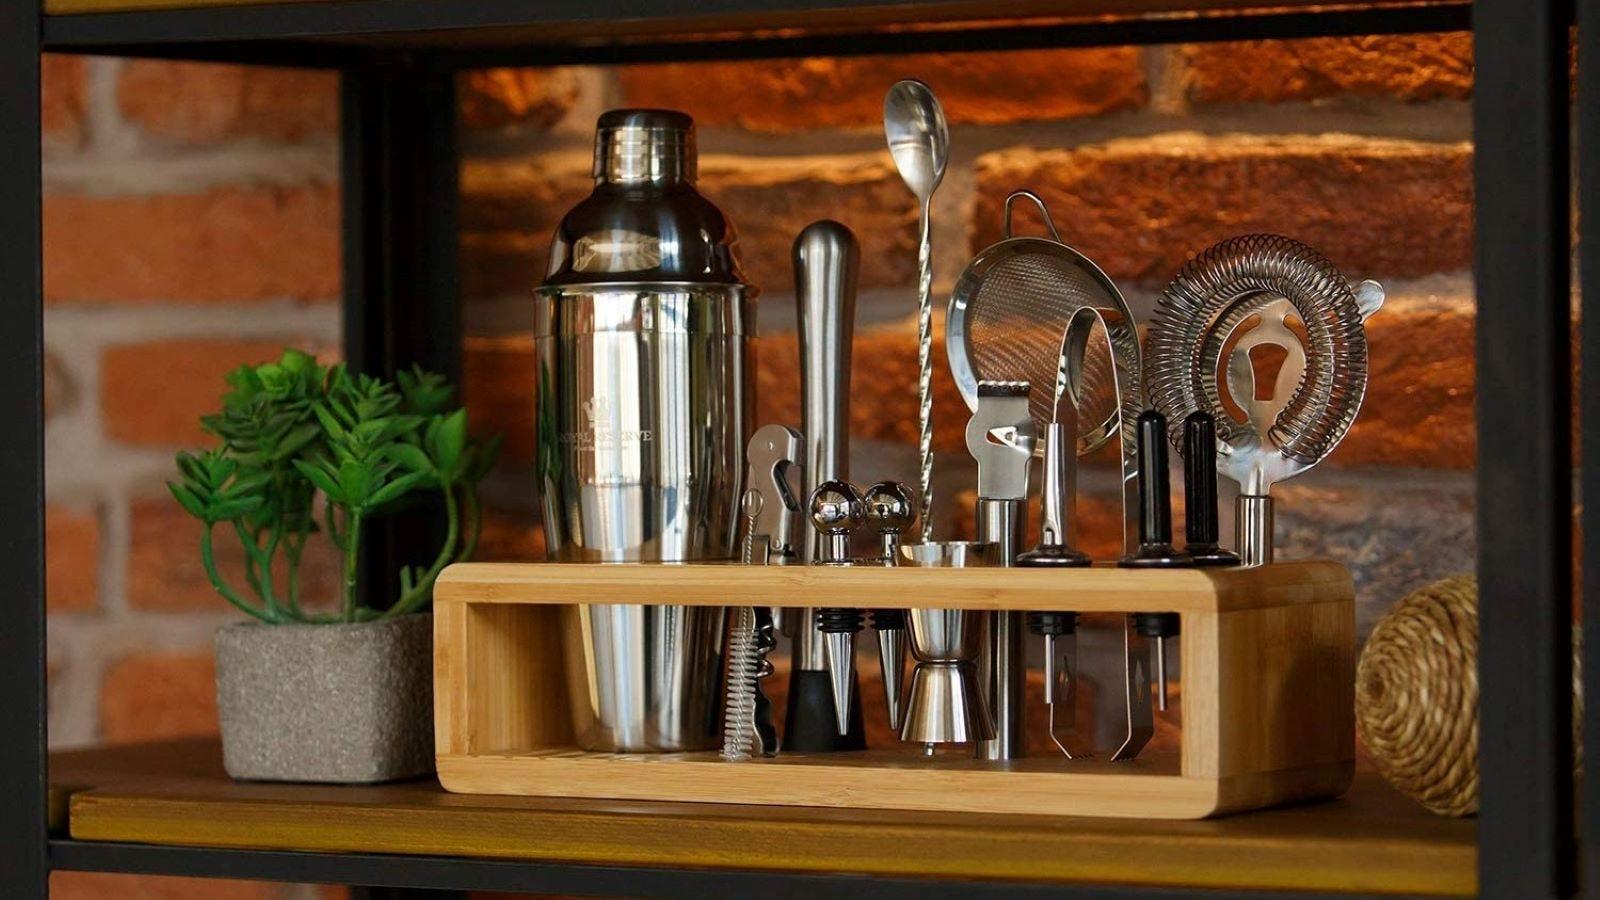 The Cocktail Mixology Shaker Set on a shelf.